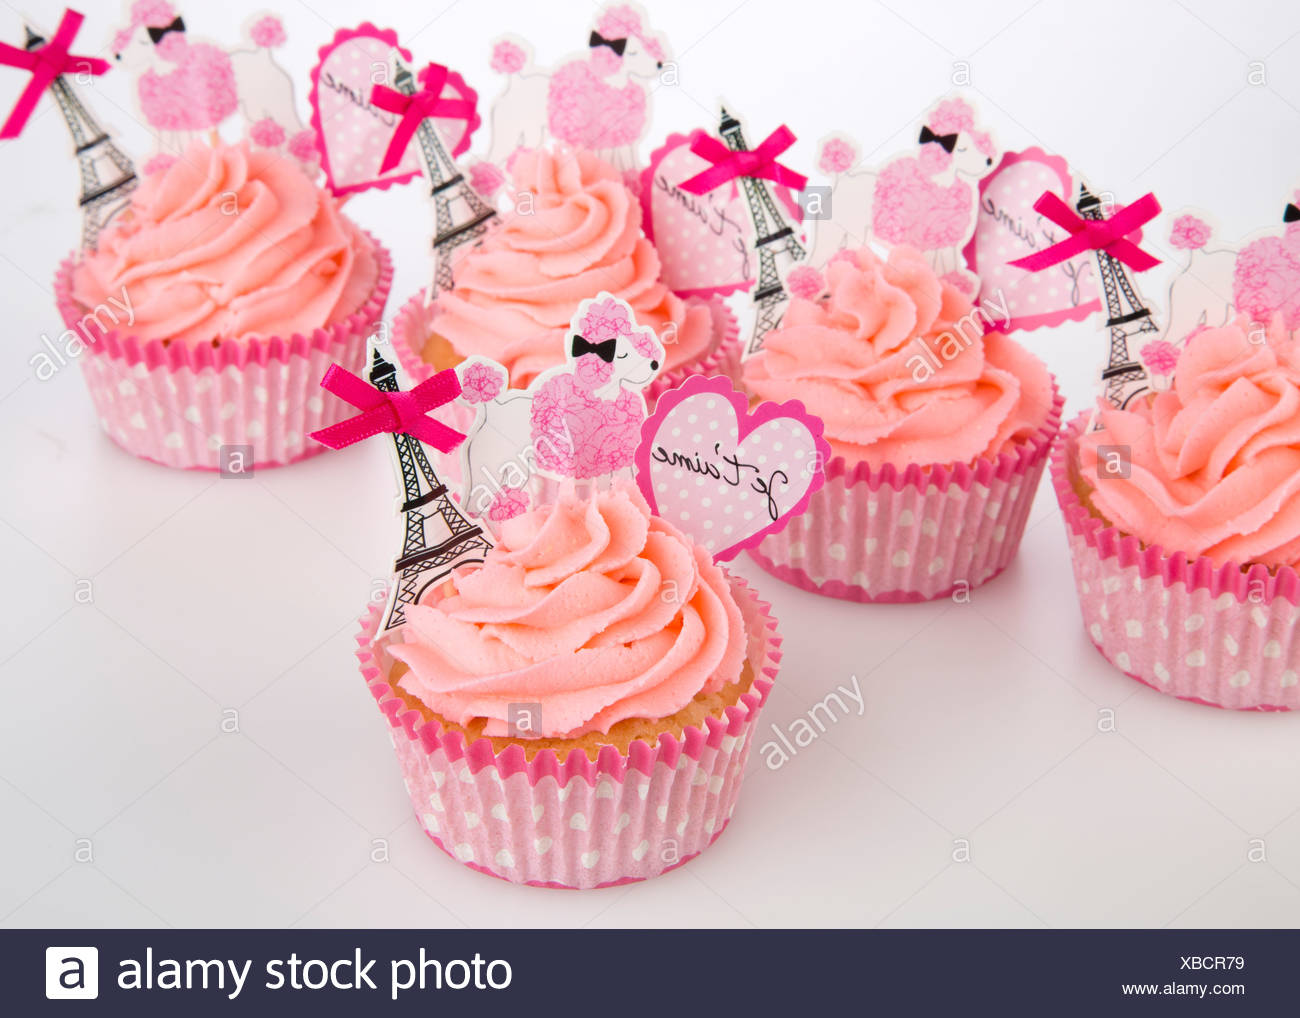 Cupcakes Tower Stock Photos & Cupcakes Tower Stock Images - Alamy